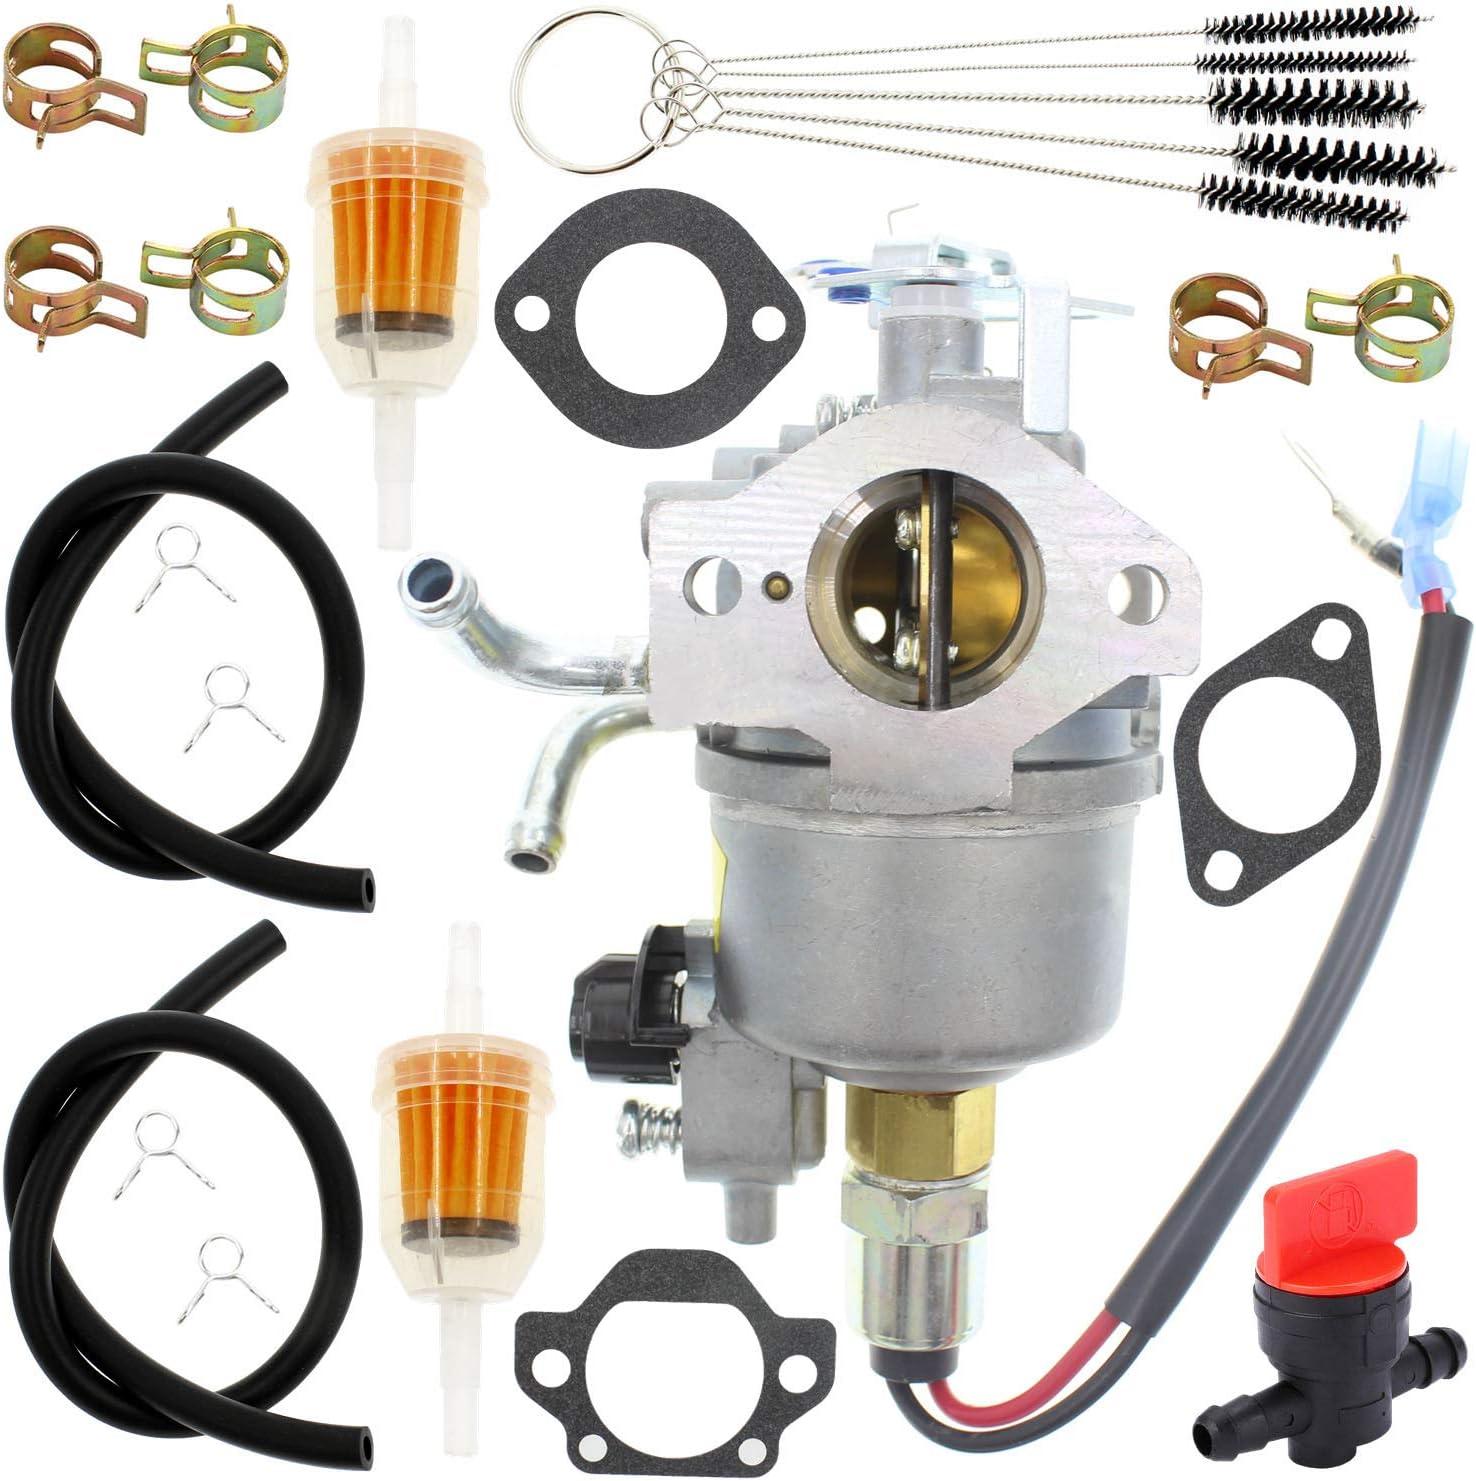 YOFMOO Carburetor Compatible for Translated Onan A041D Cummins Rapid rise RV Generator